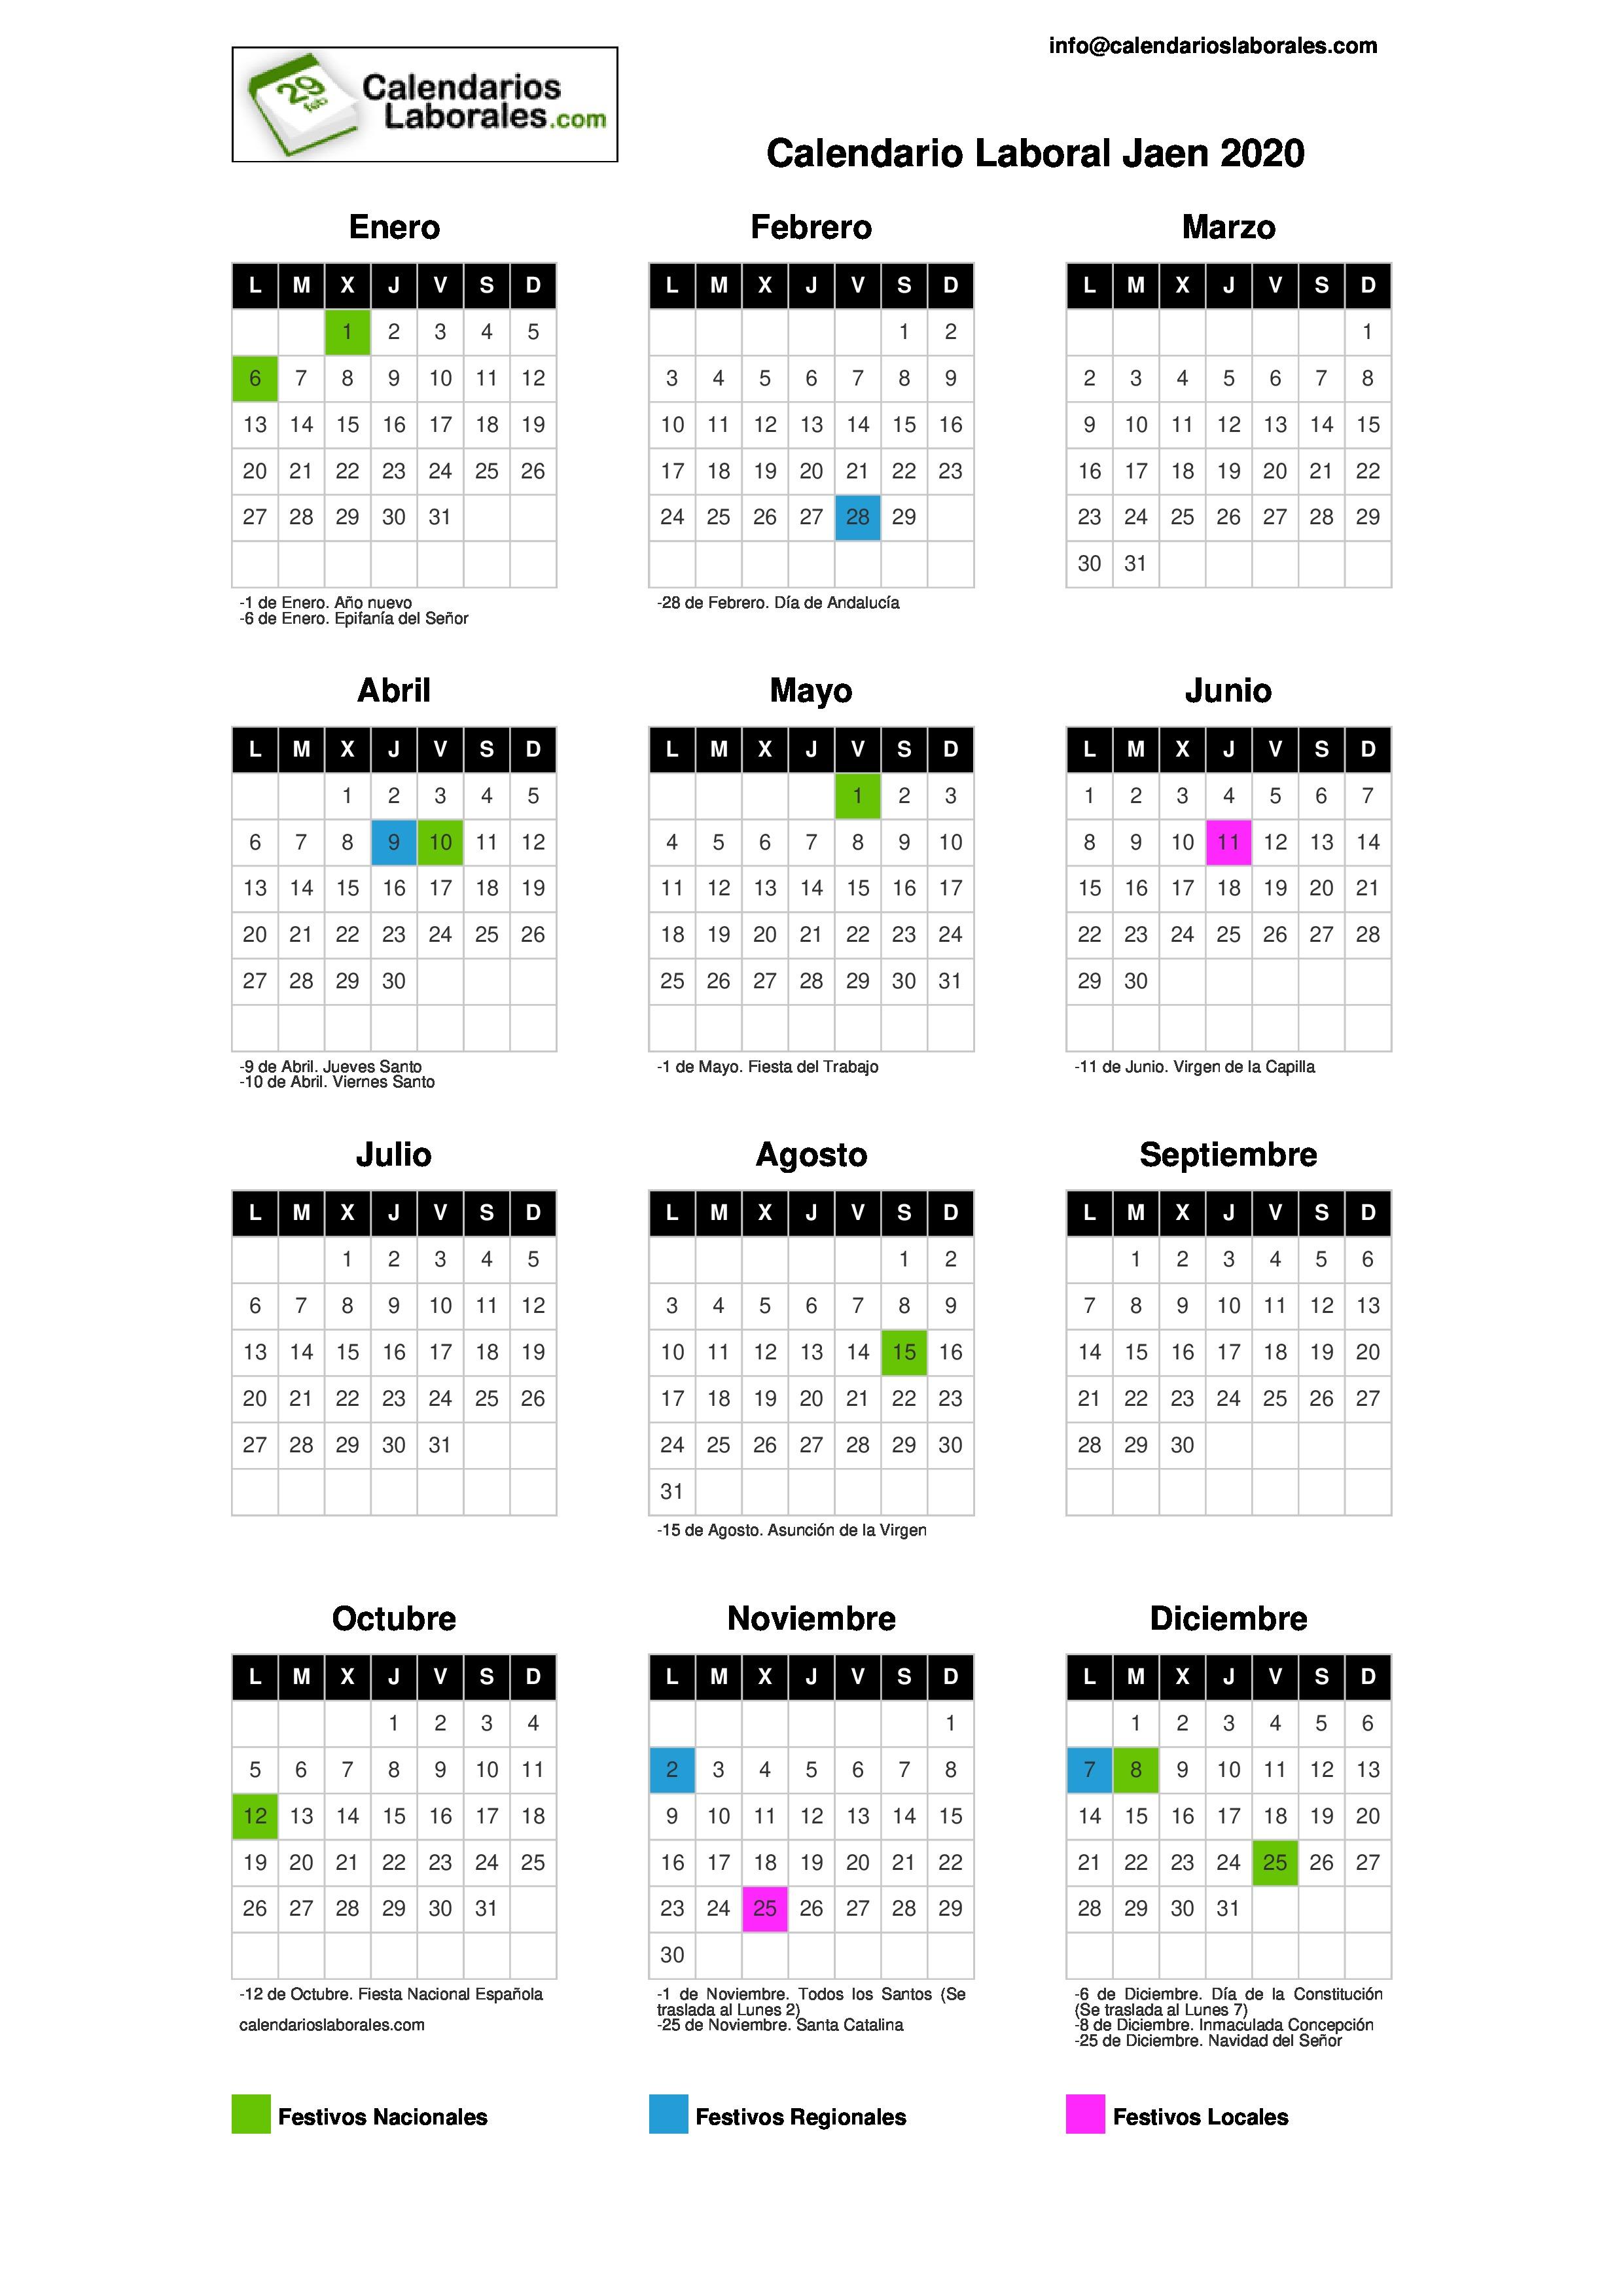 Calendario Laboral Jaen 2020.Calendario Laboral Jaen 2020